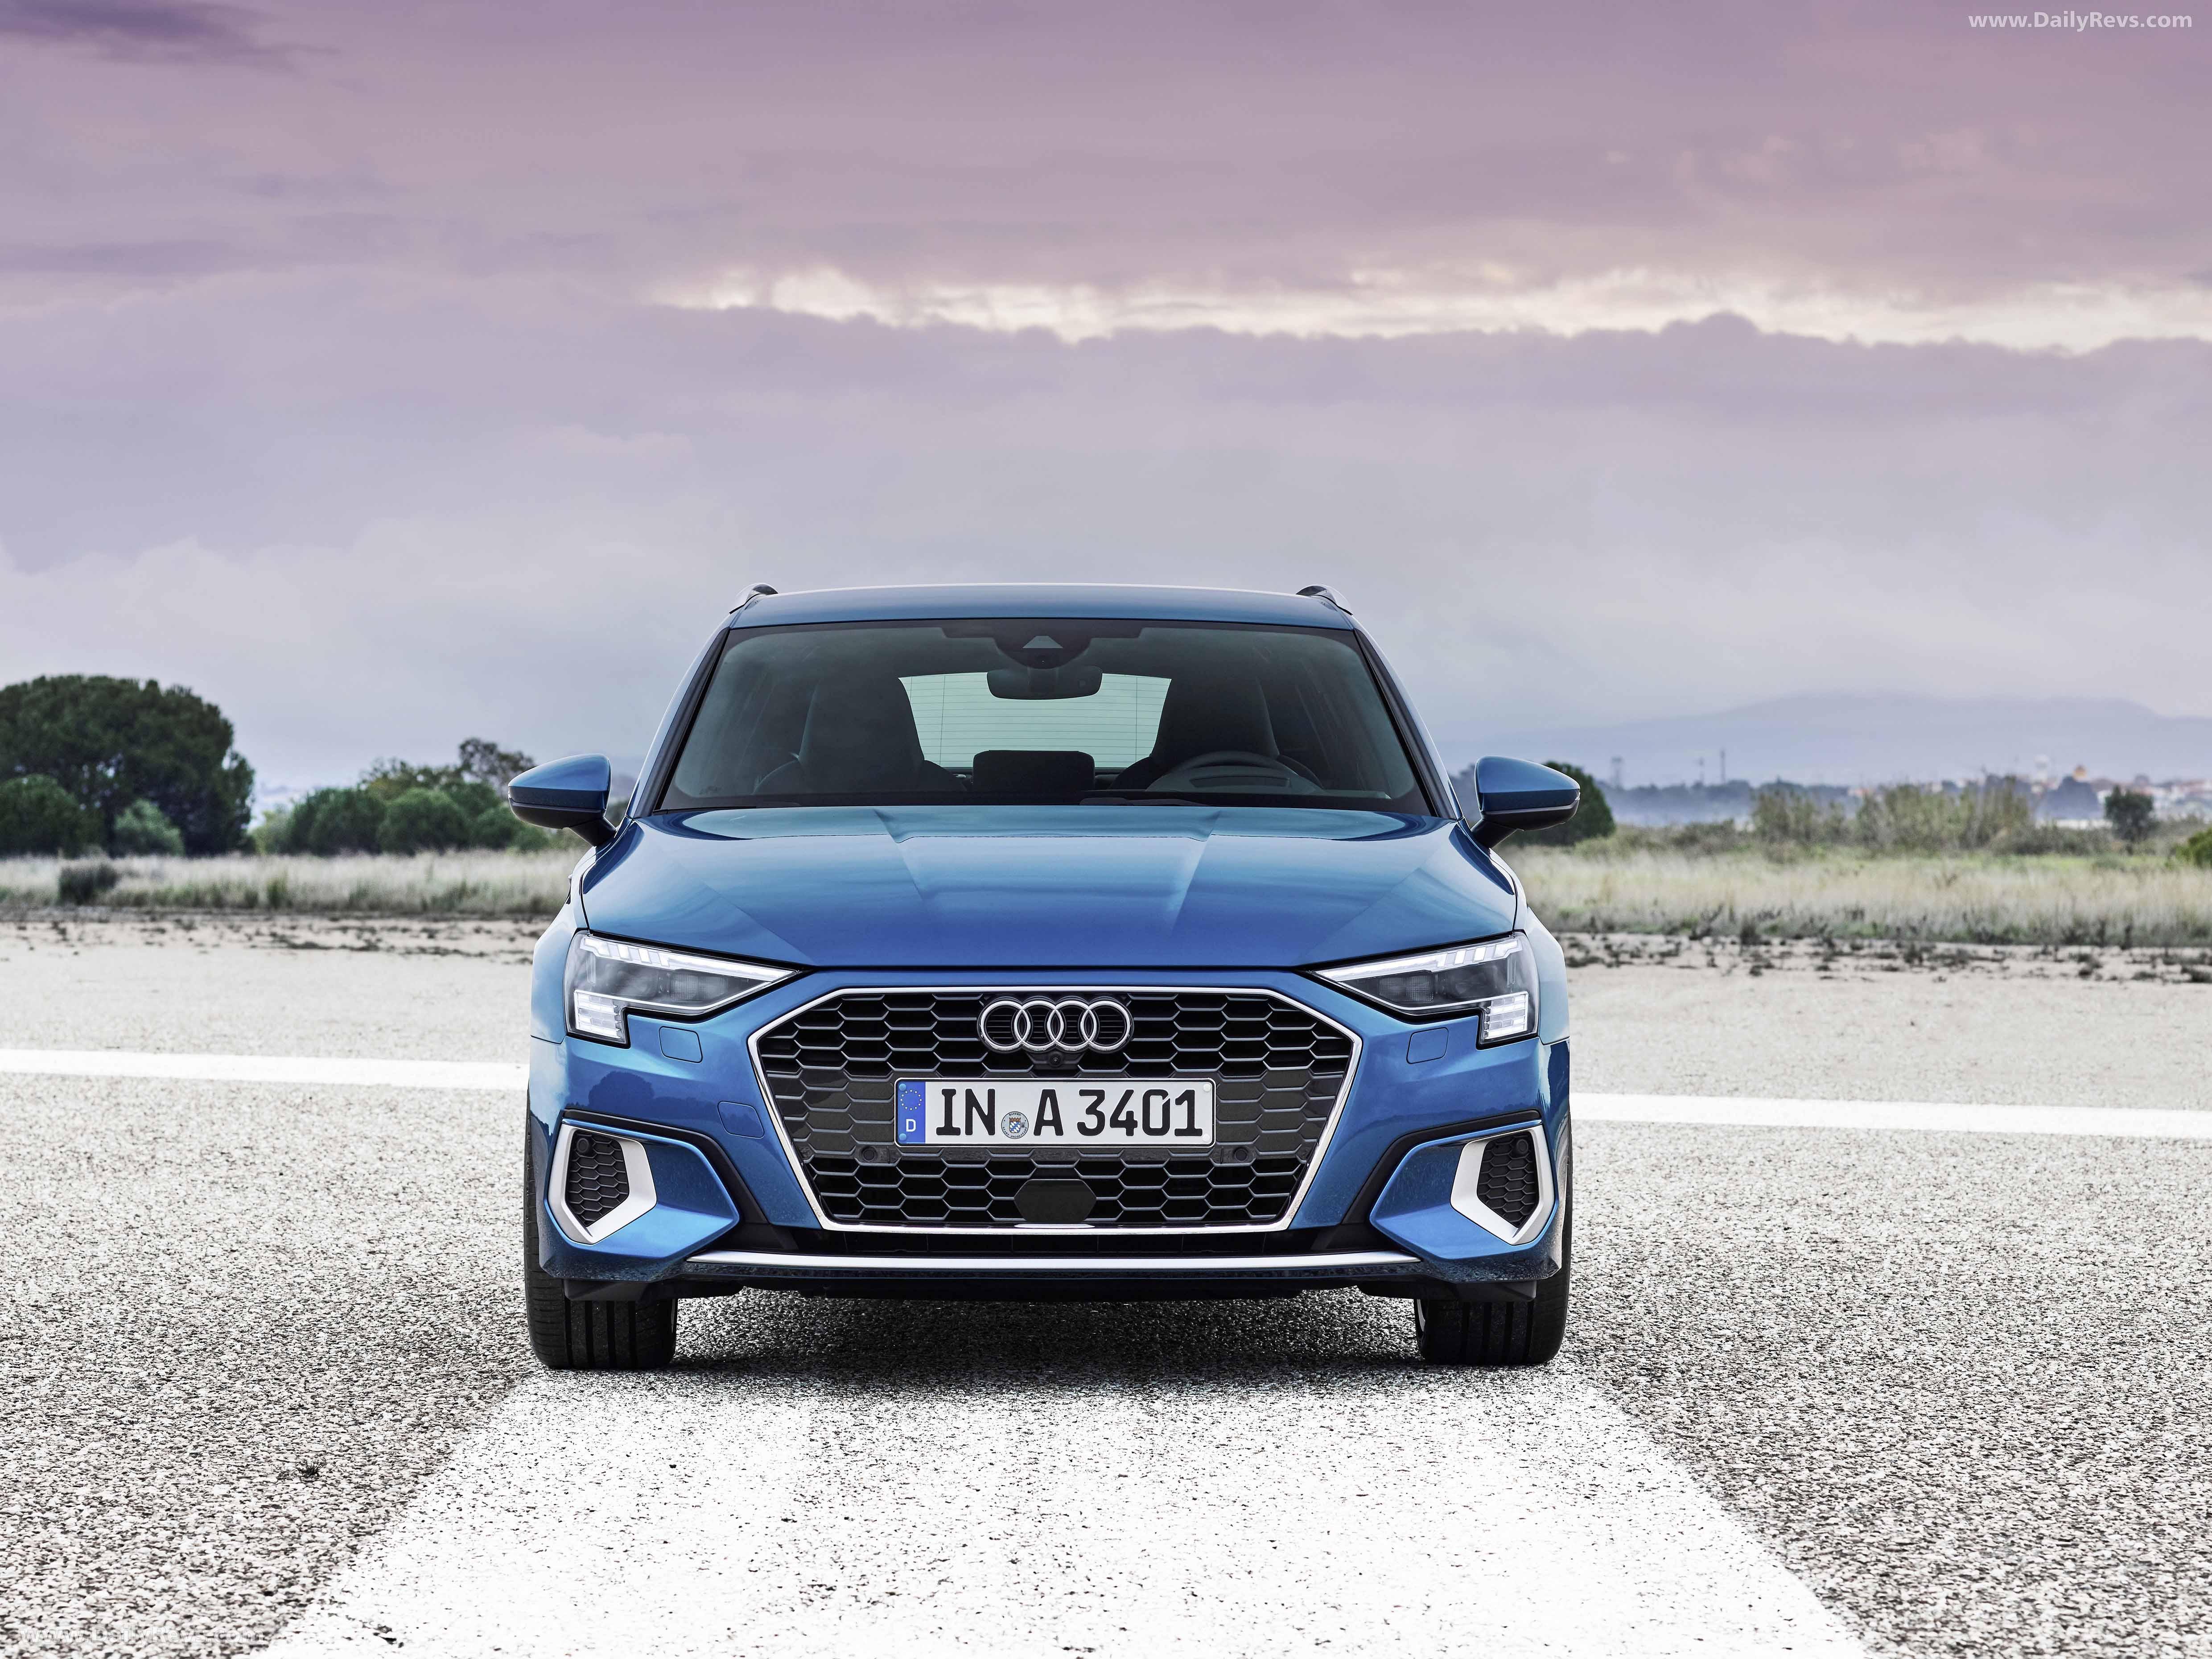 2021 Audi A3 Sportback - HD Pictures, Videos, Specs ...